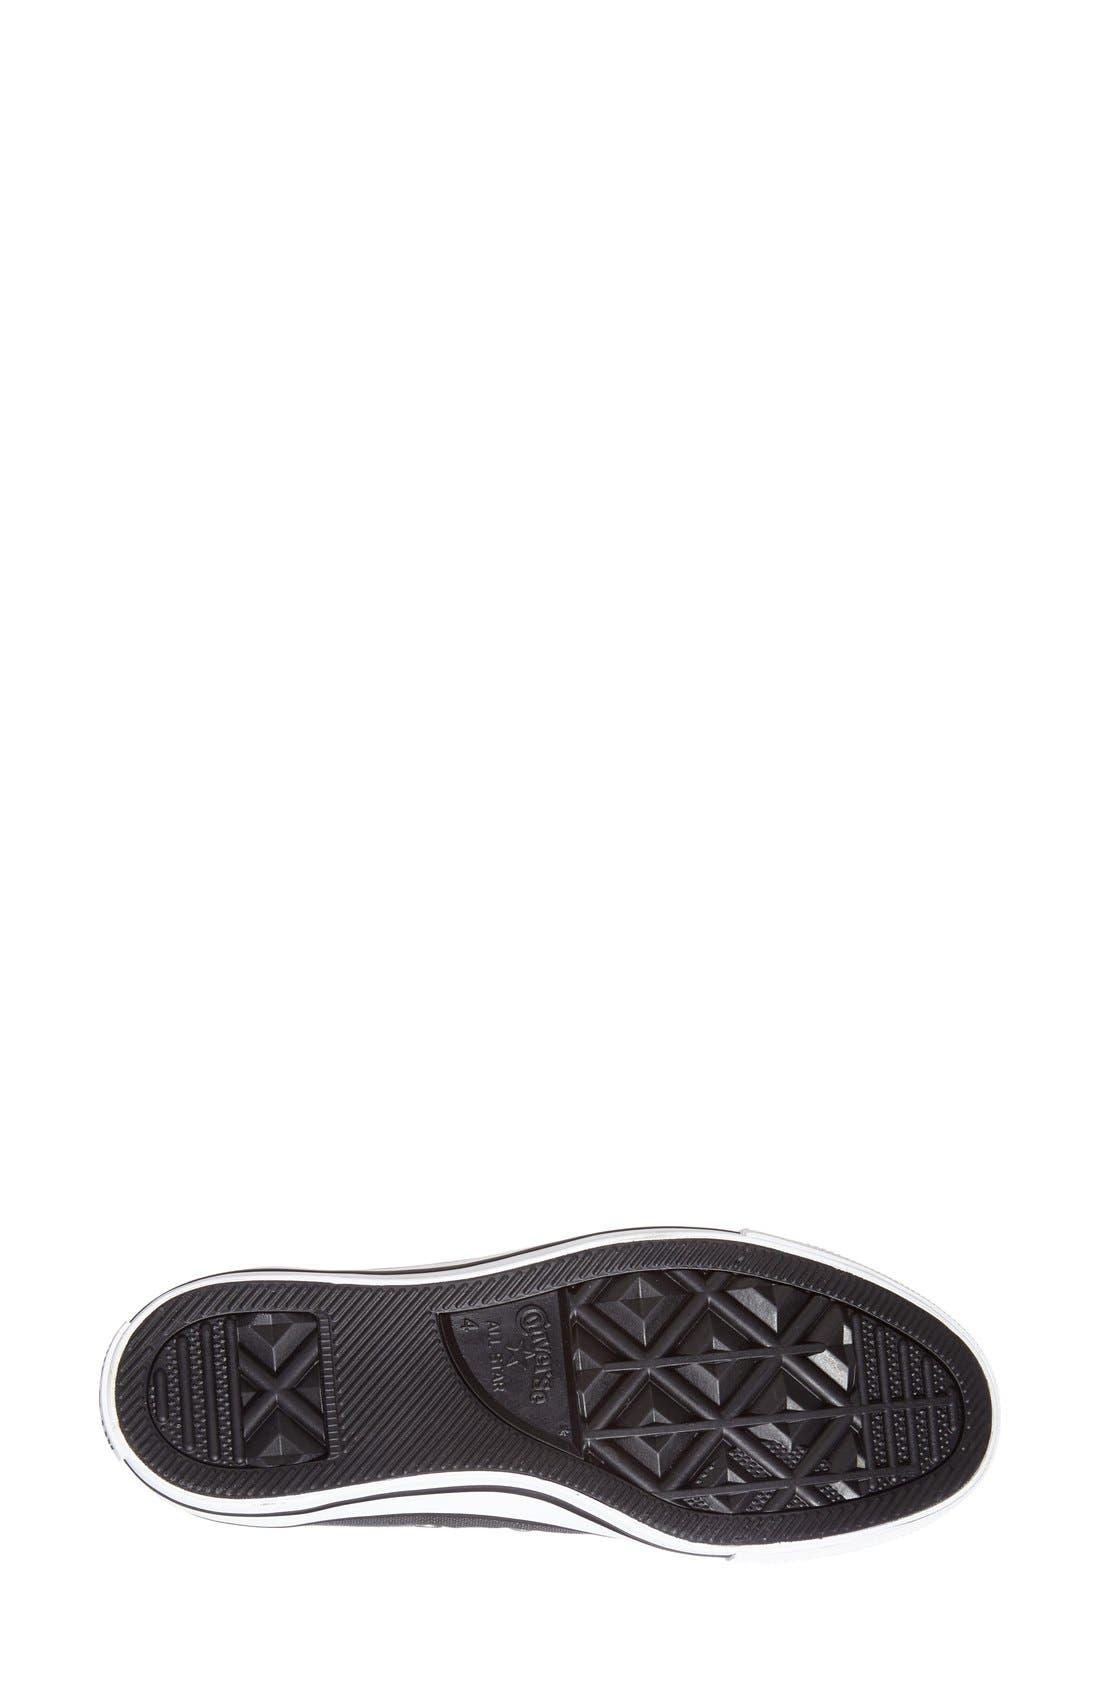 Alternate Image 3  - Converse Chuck Taylor® All Star® Low Top Sneaker (Women)